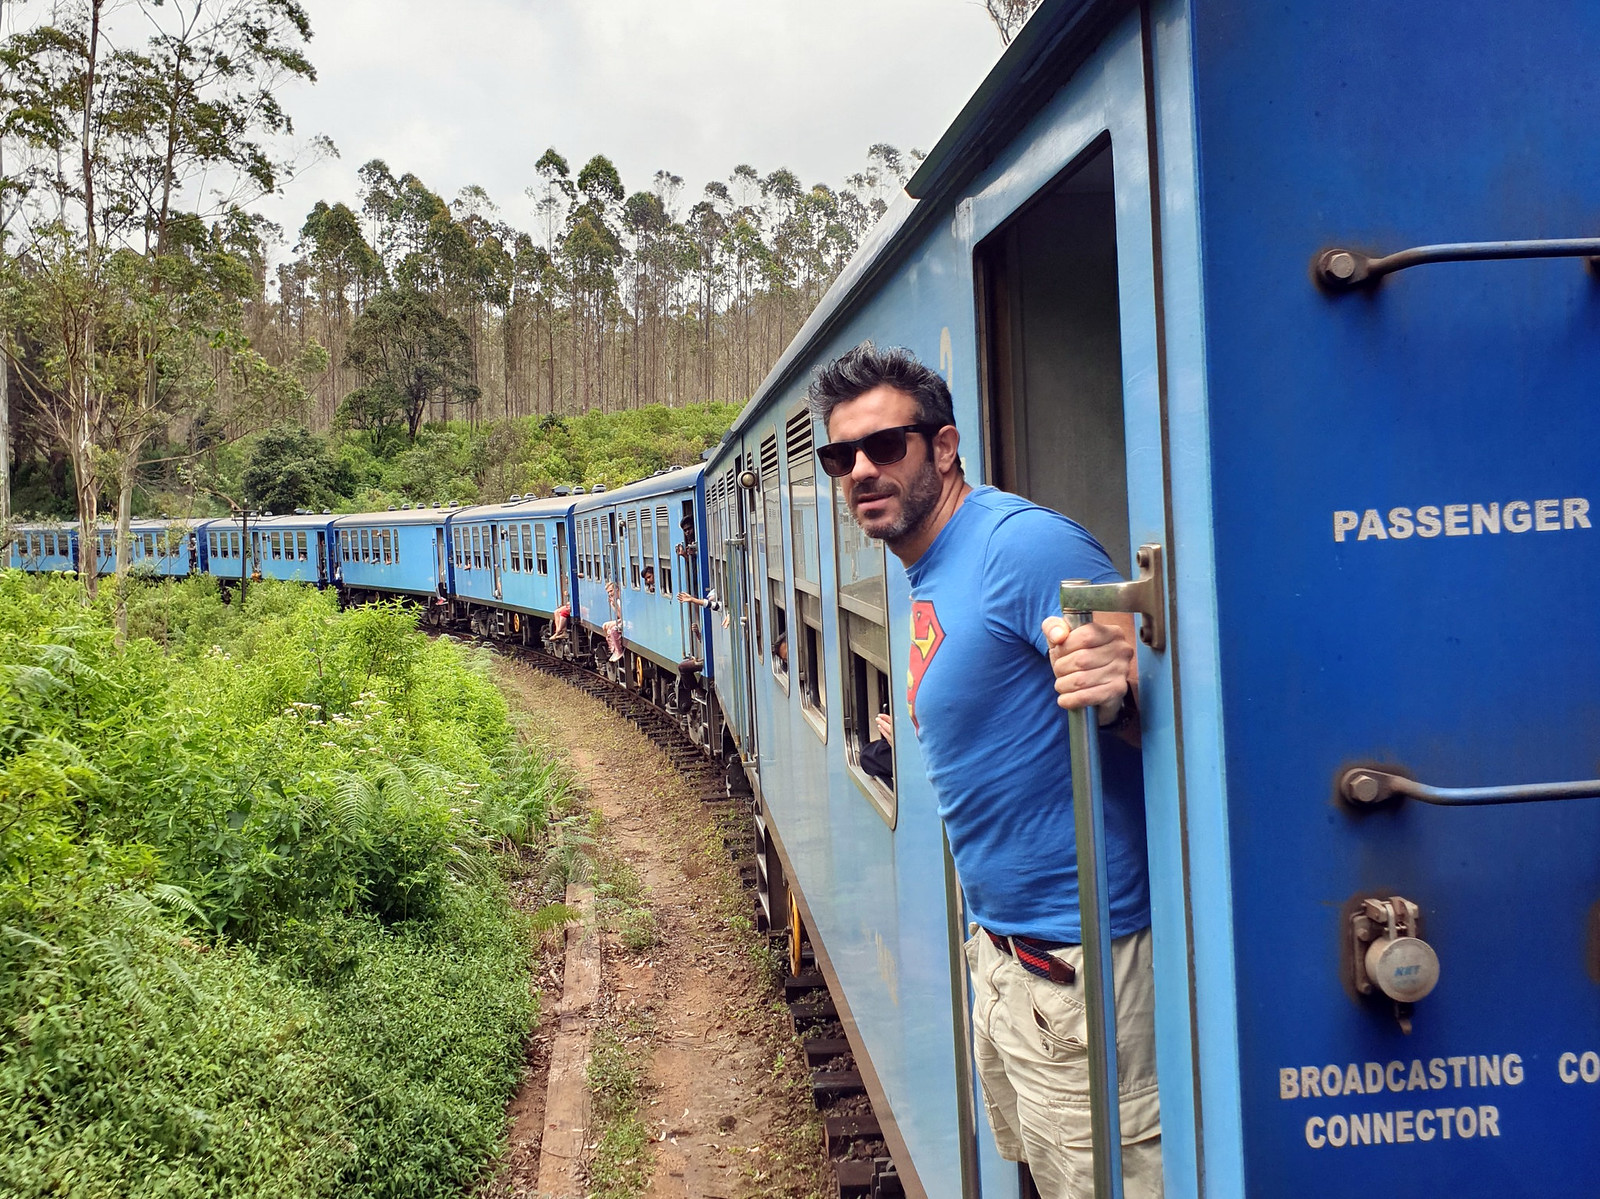 Tren de Ella, Ella Railway - Sri Lanka tren de ella - 31954657157 6ce171c39c h - Tren de Ella en Sri Lanka: ¿El viaje en tren más pintoresco del mundo?